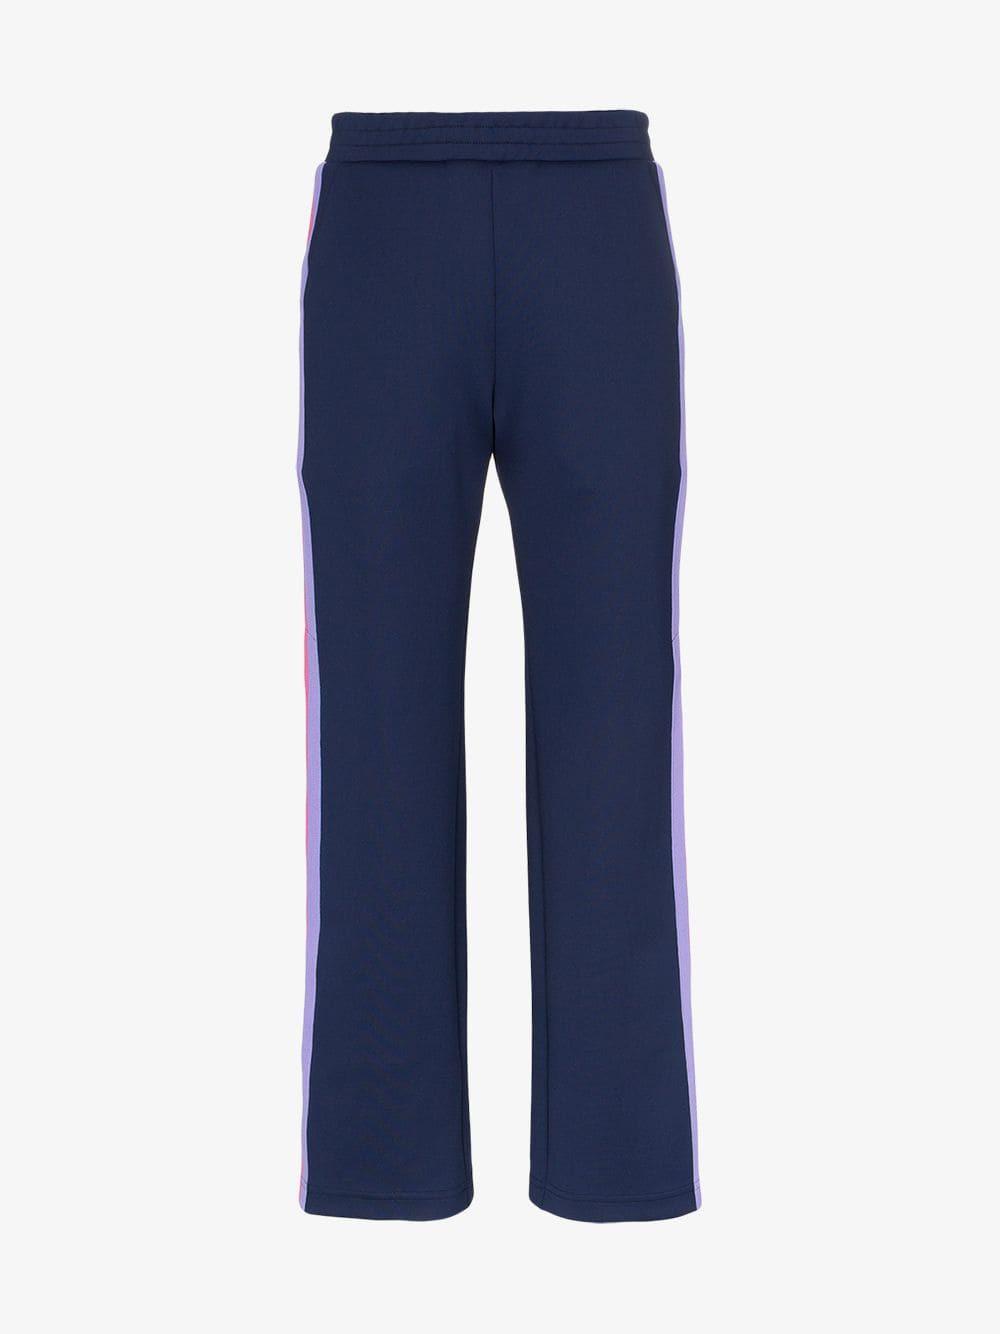 Mira Mikati striped popper button trousers in blue